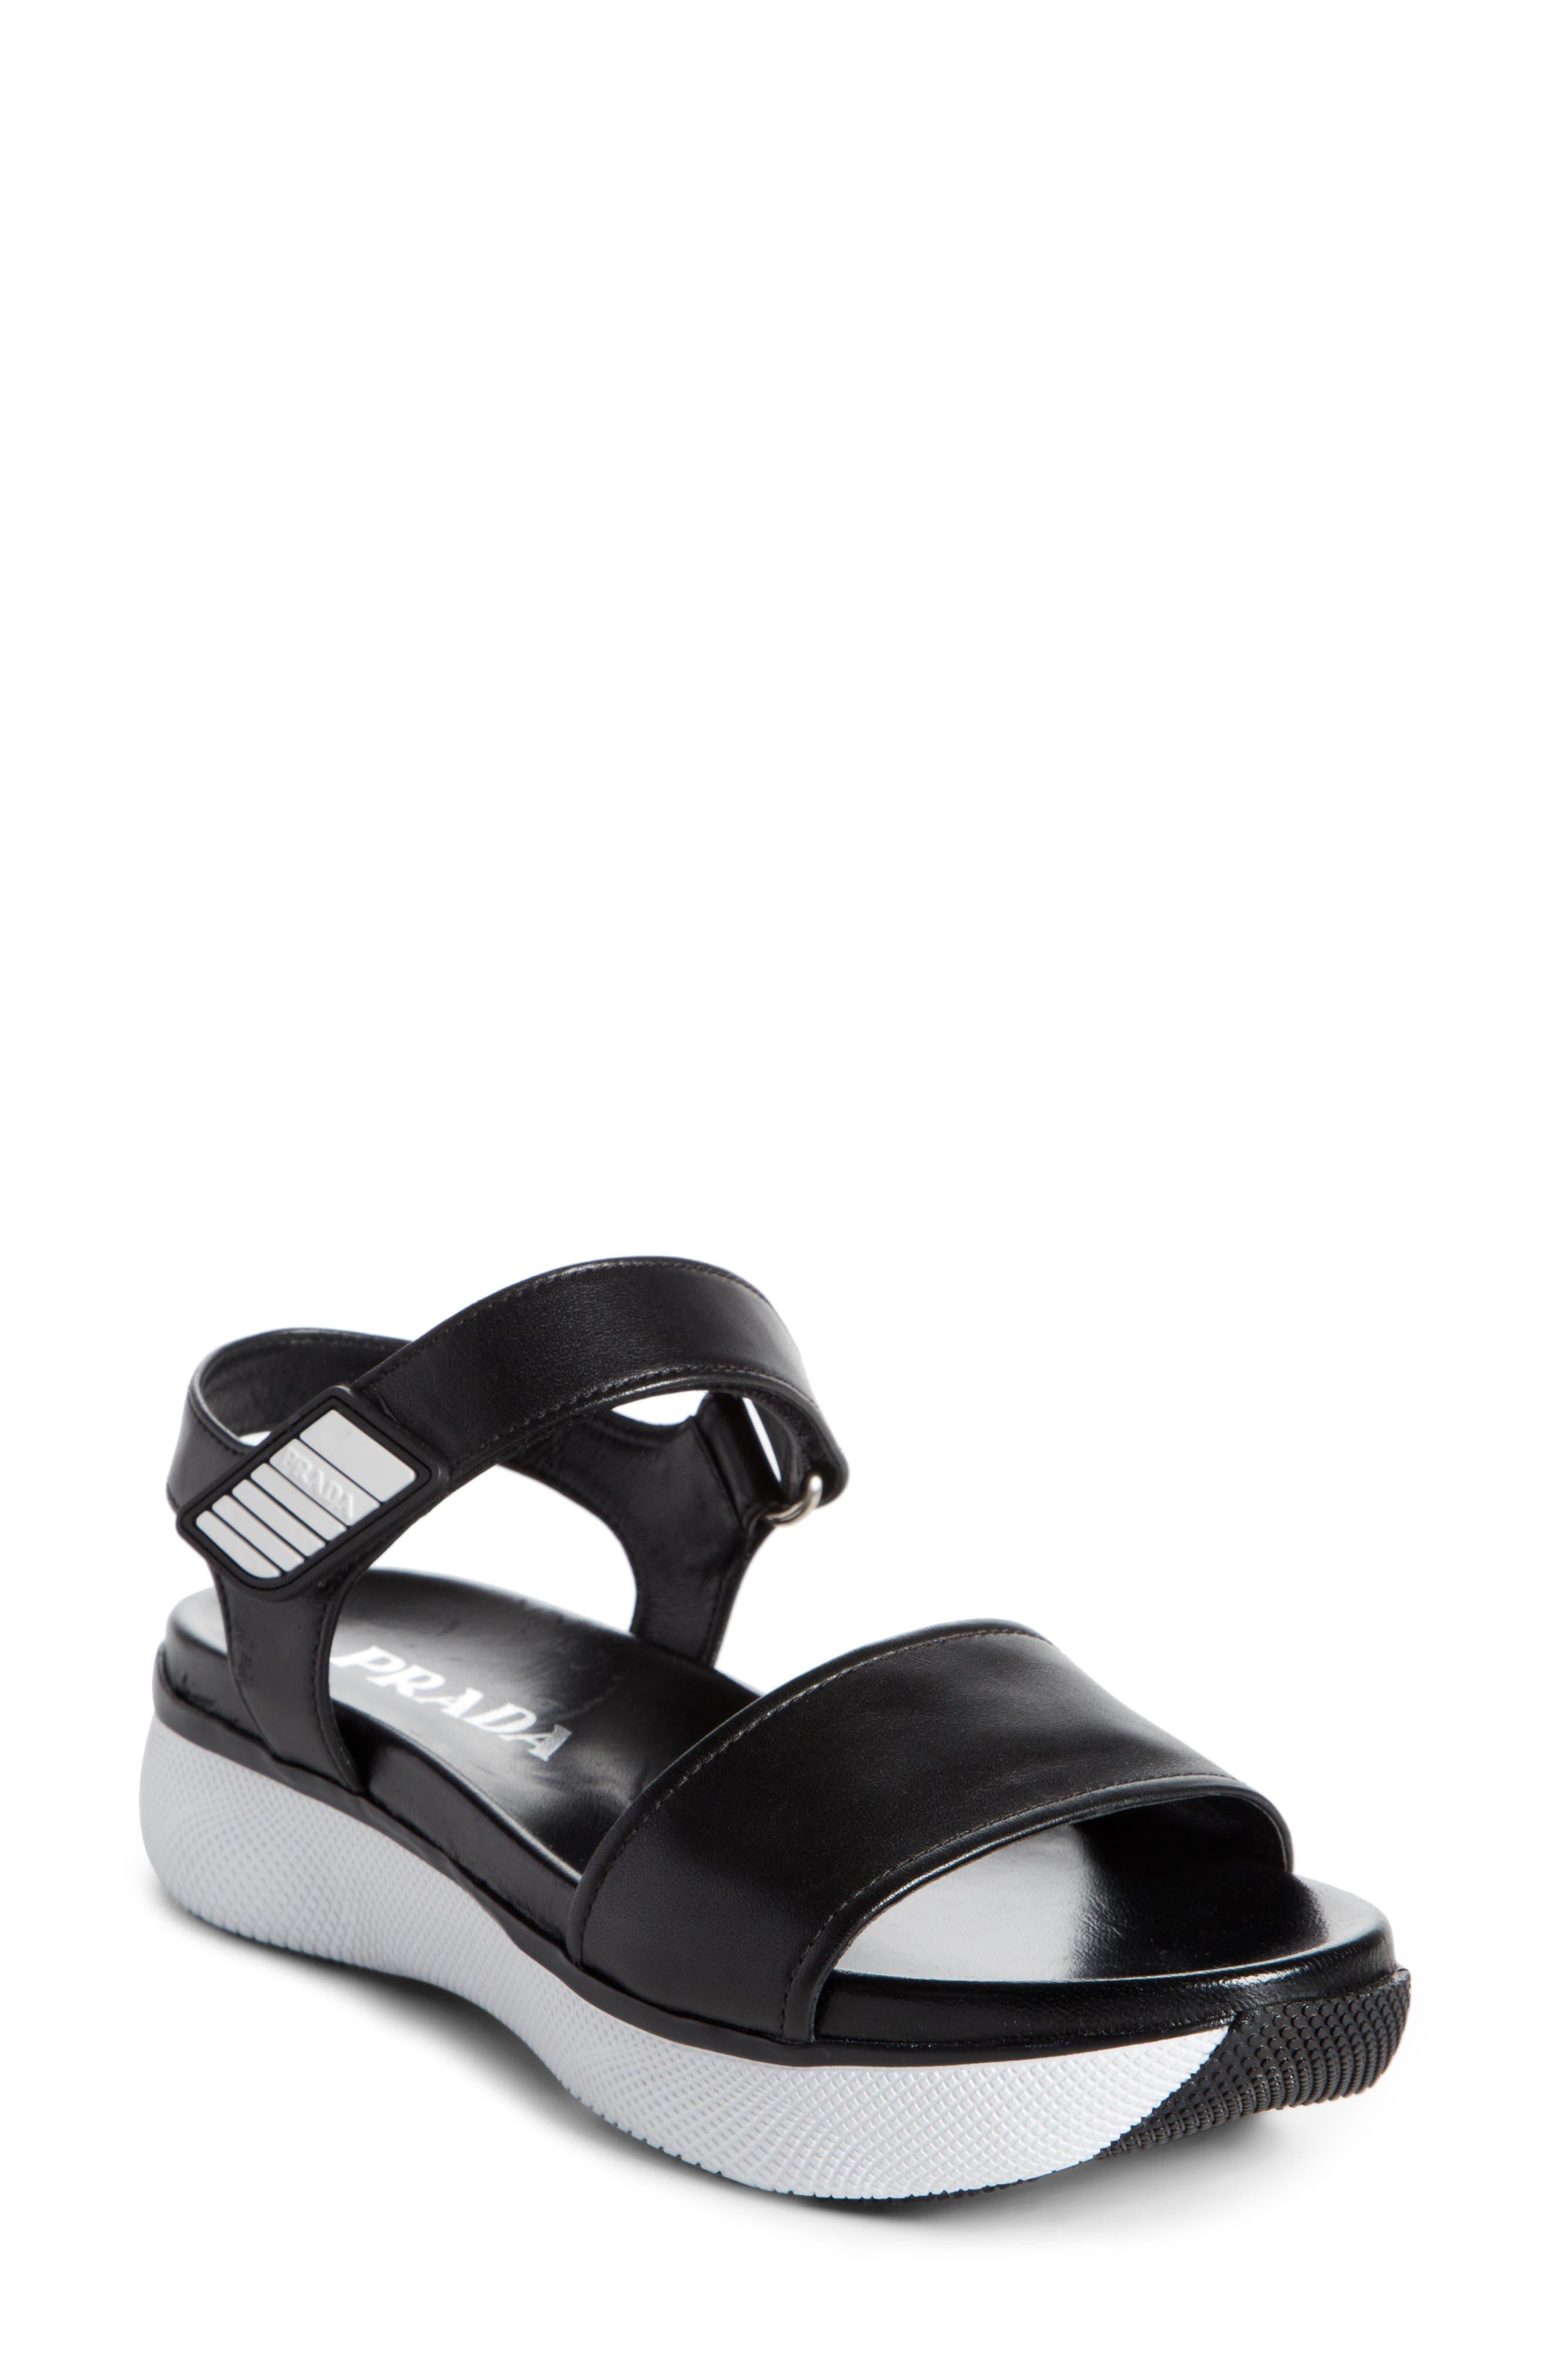 Platform Sandal,                             Main thumbnail 1, color,                             002